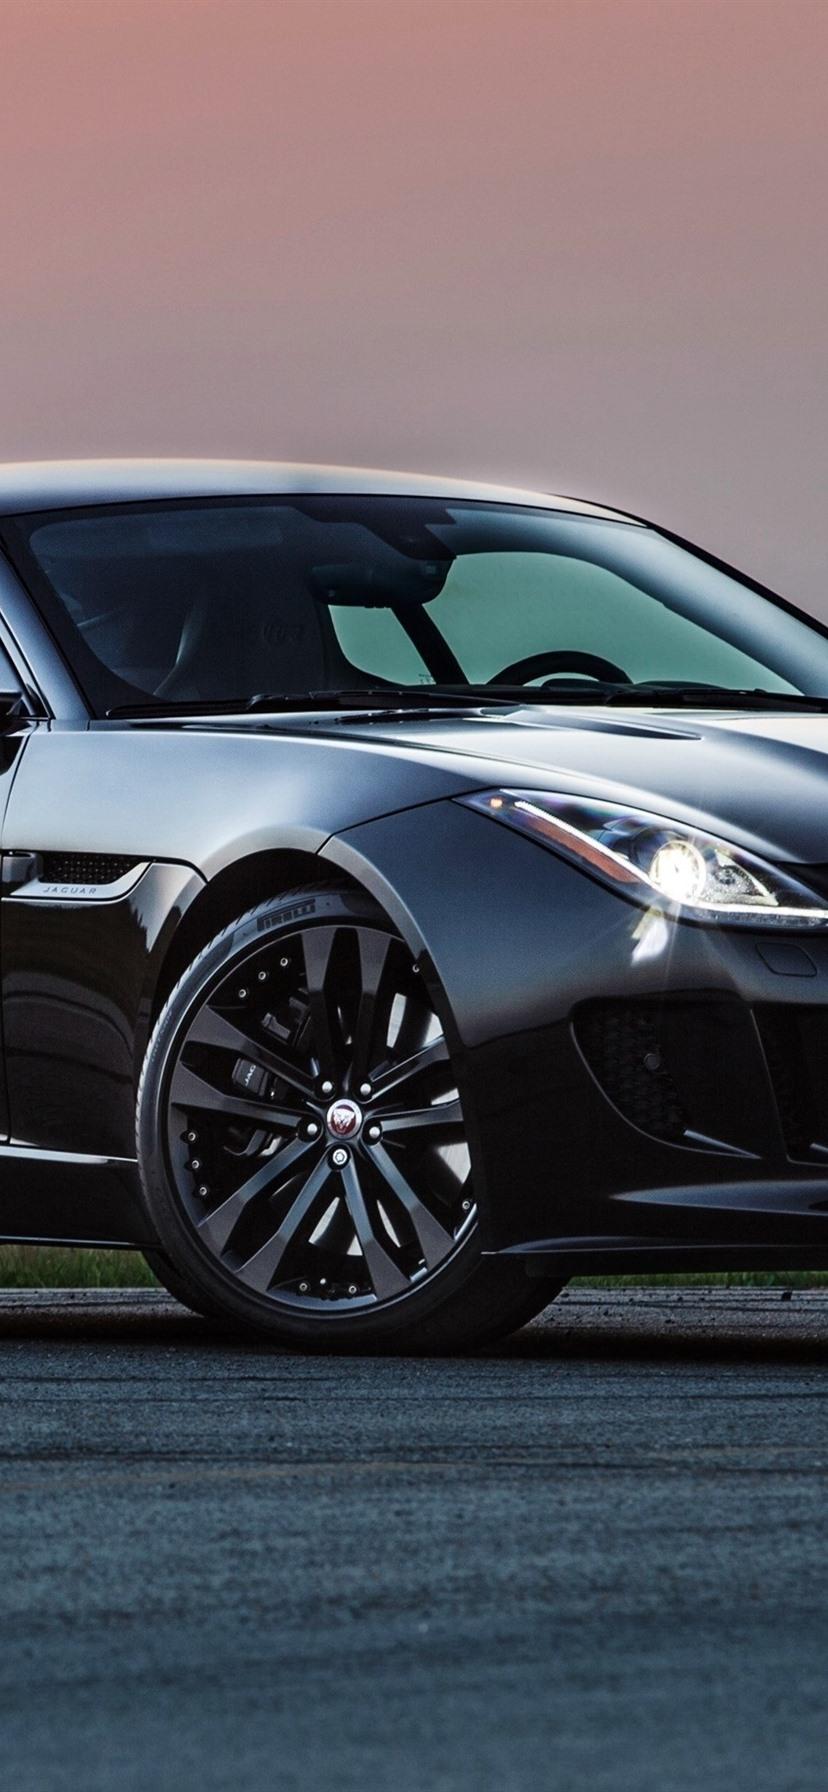 Jaguar Black Supercar Sunset 828x1792 Iphone 11 Xr Wallpaper Background Picture Image